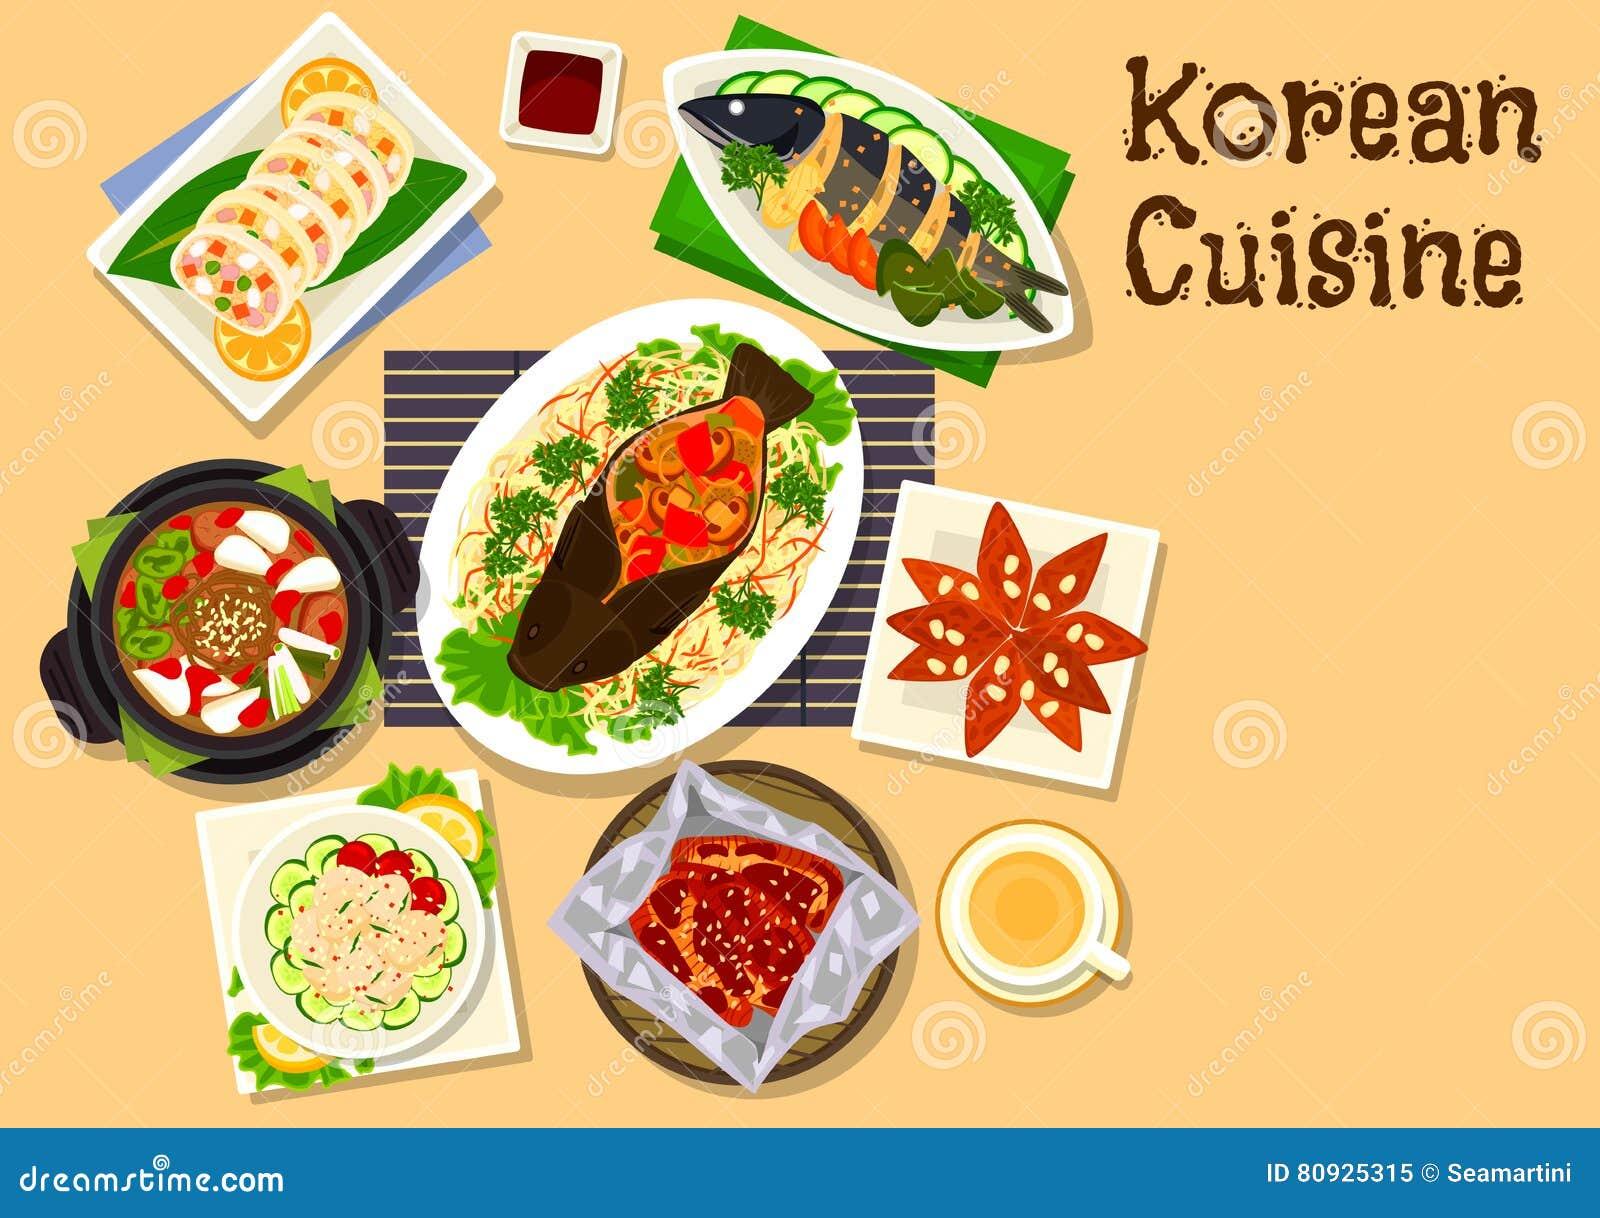 Korean Cuisine Seafood Dinner Dishes ...